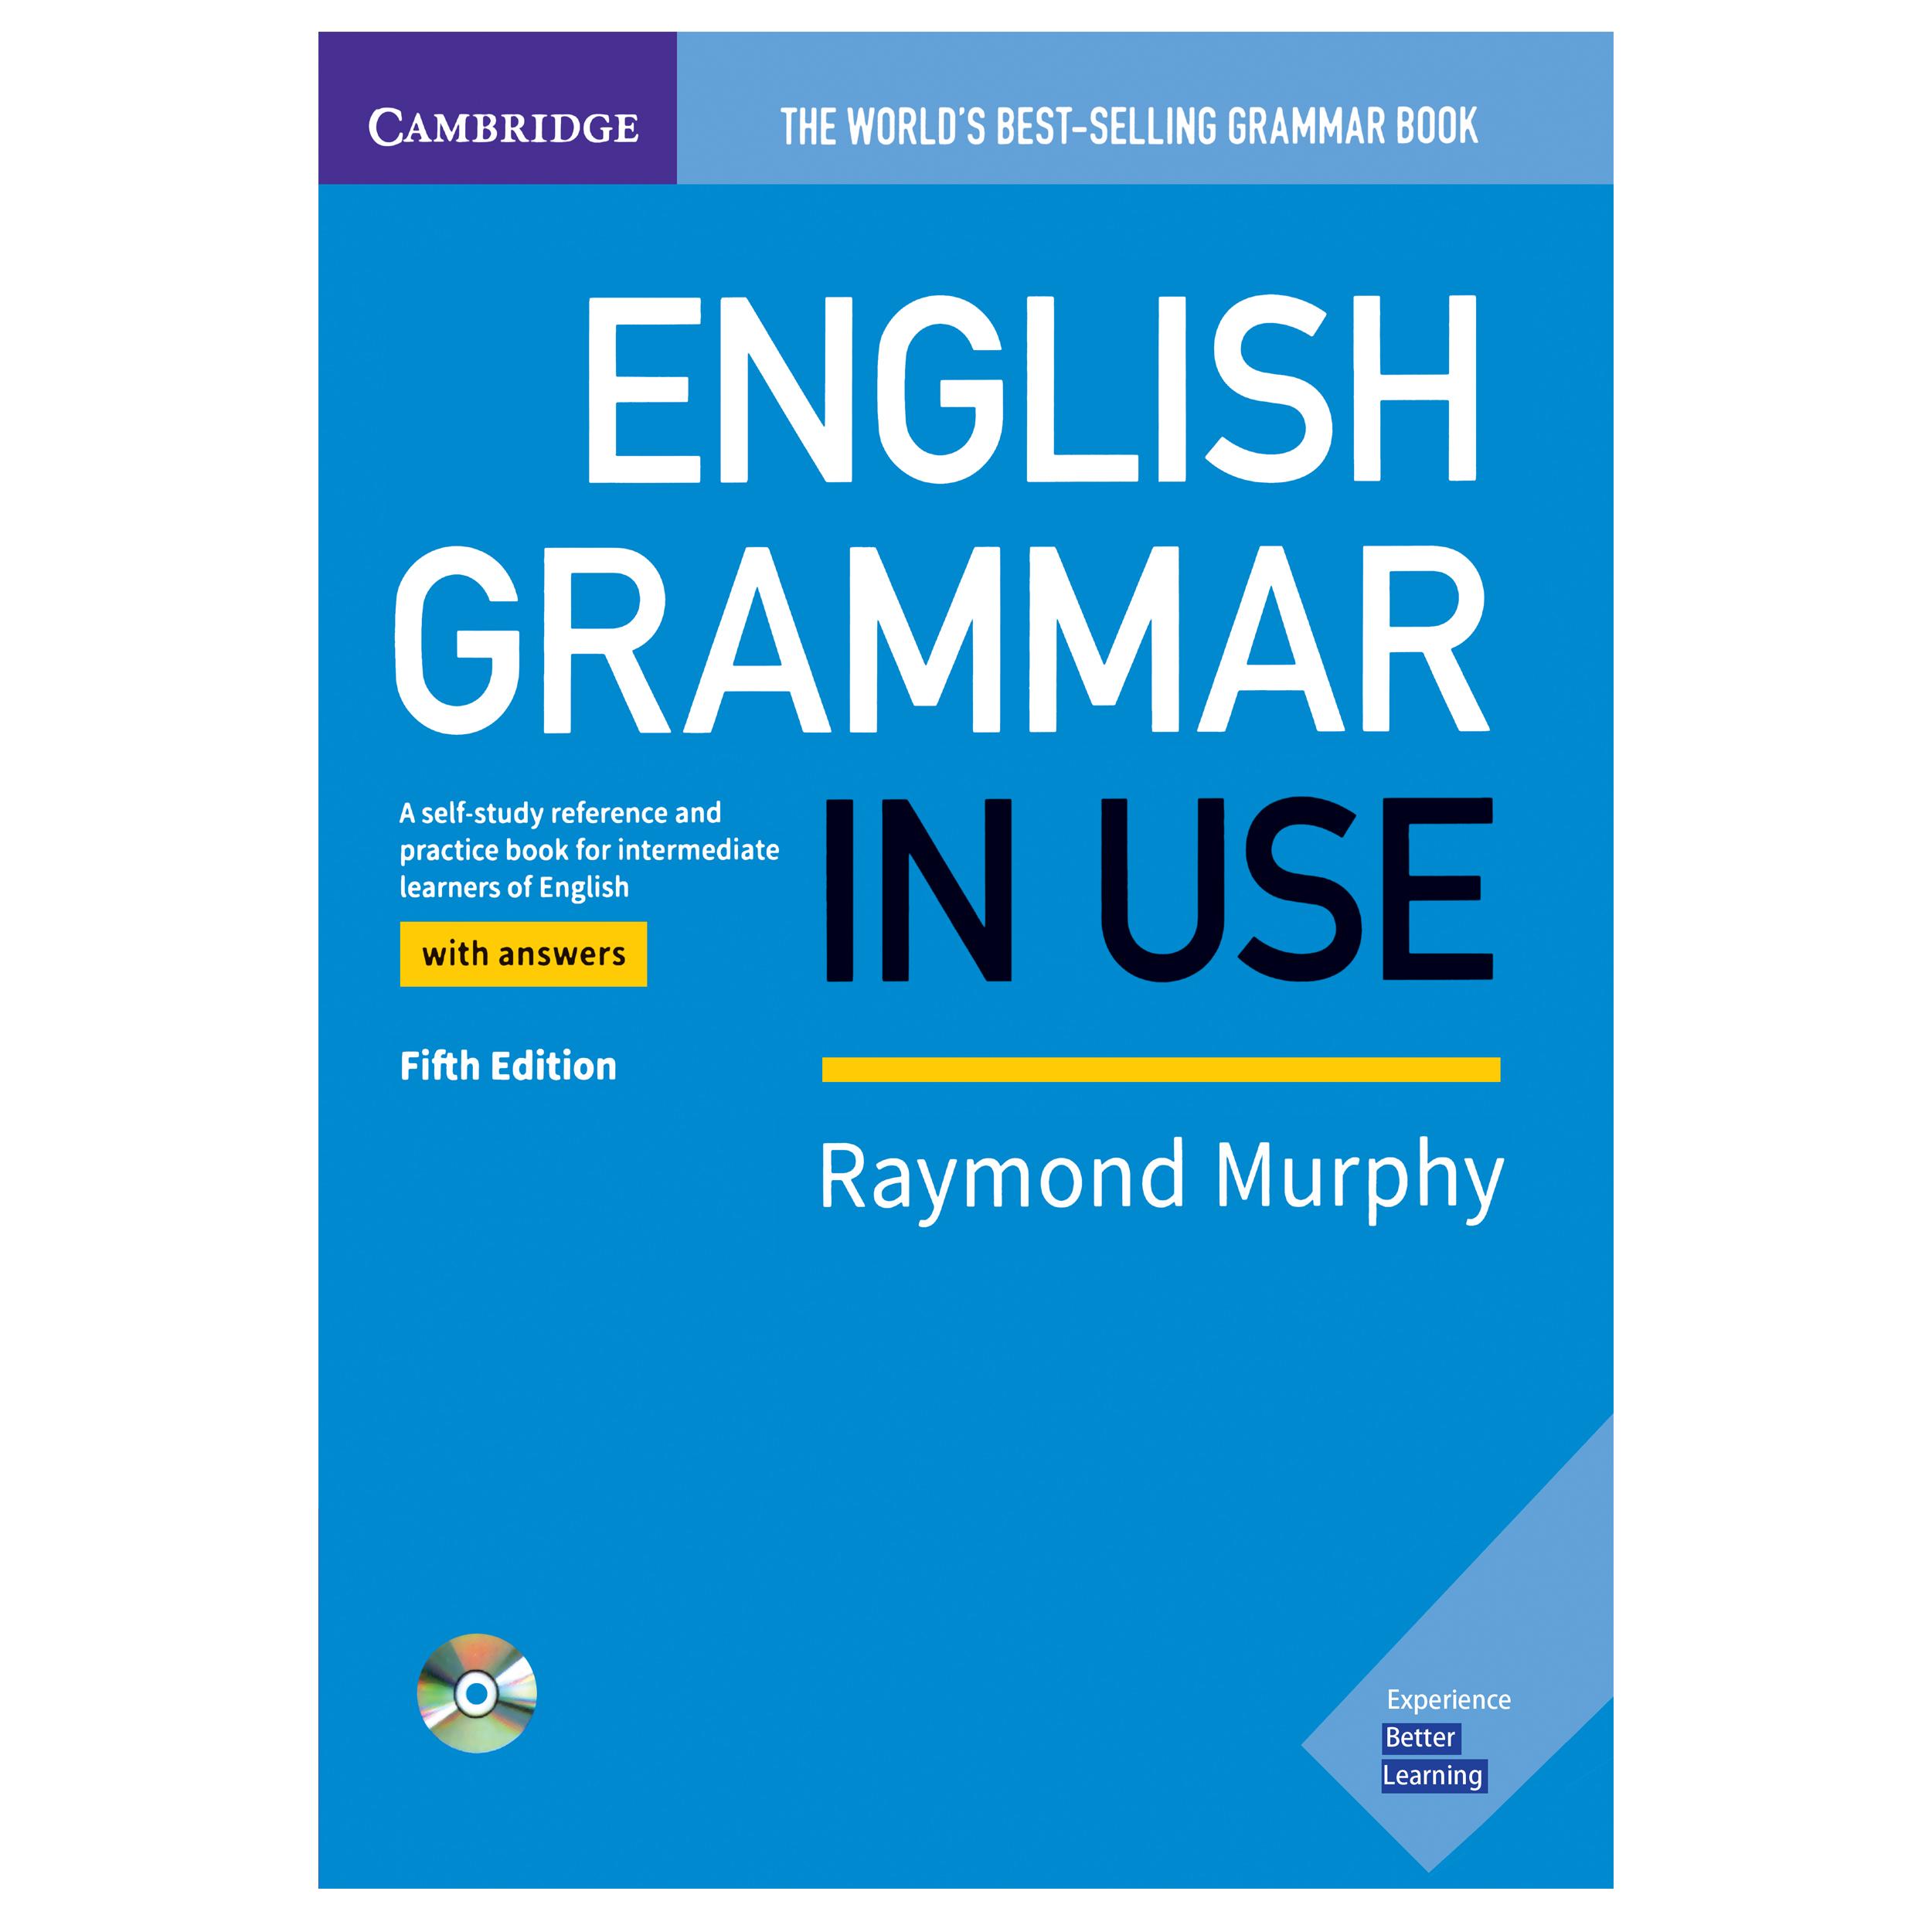 کتاب English Grammar in Use- Fifth Edition اثر Raymond Murphy انتشارات هدف نوین